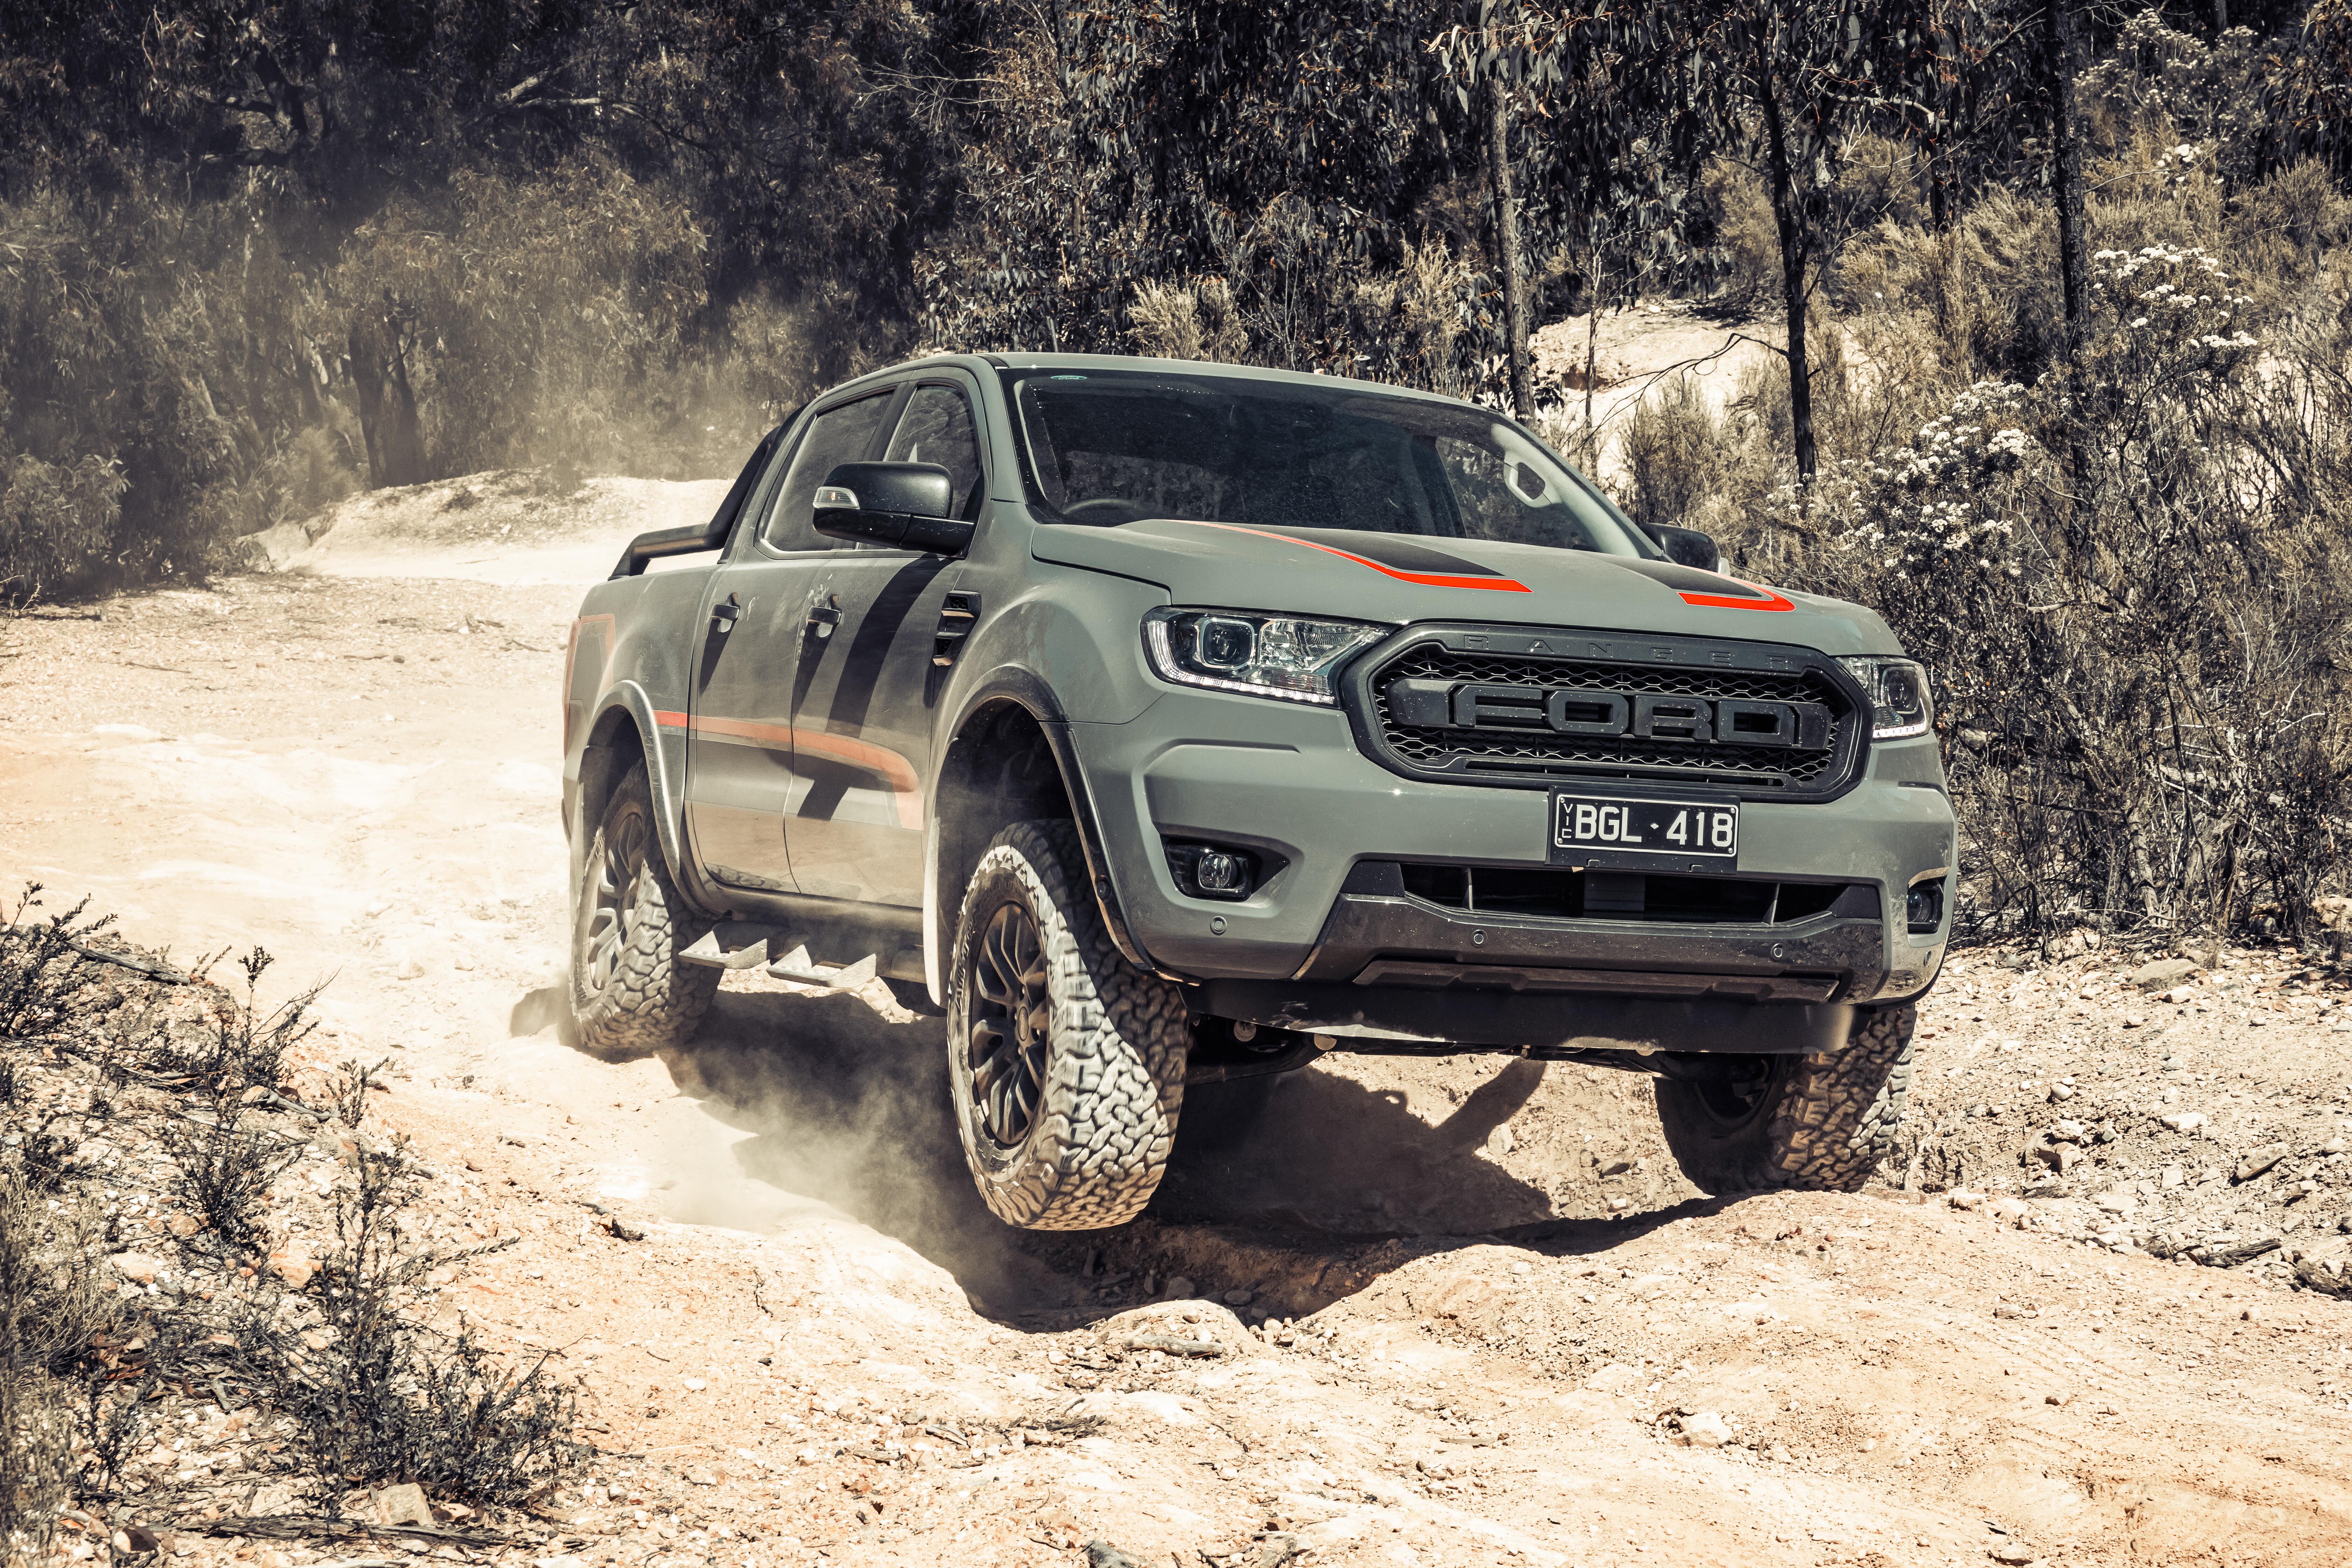 4 X 4 Australia Comparisons 2021 May 21 Ford Ranger FX 4 MAX 12